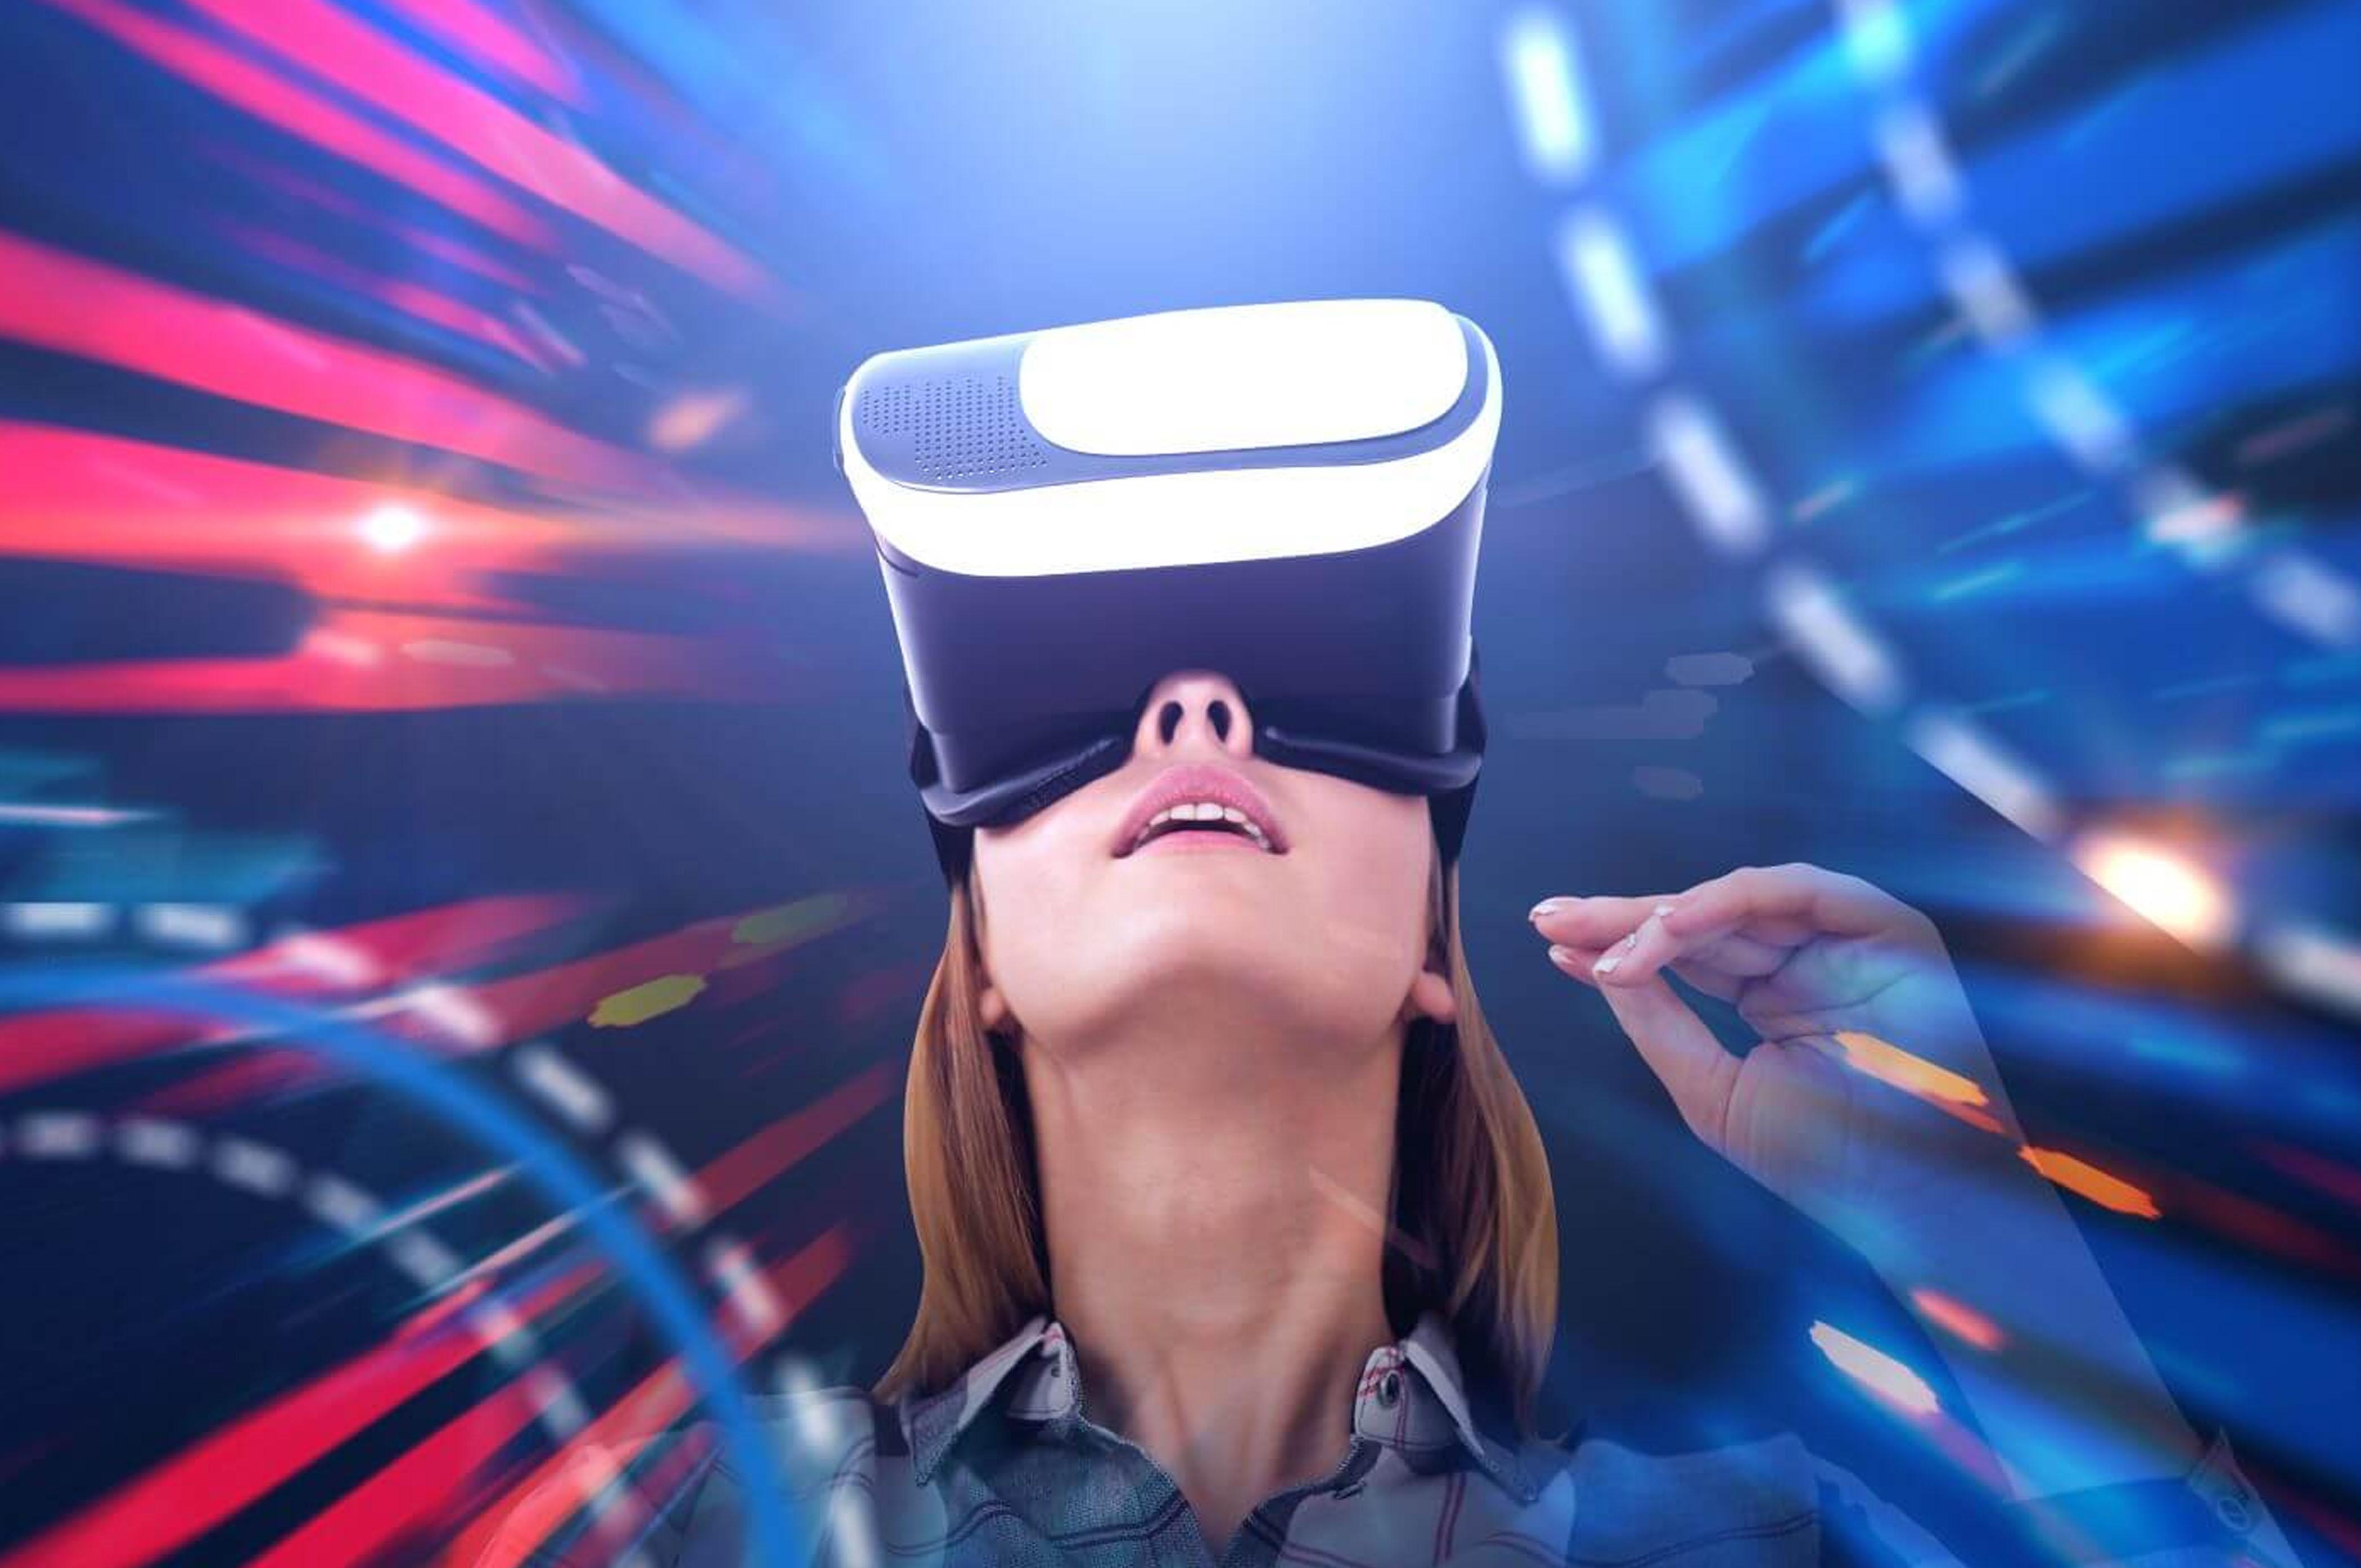 Interattiva | Tecnologia Virtual Reality 360